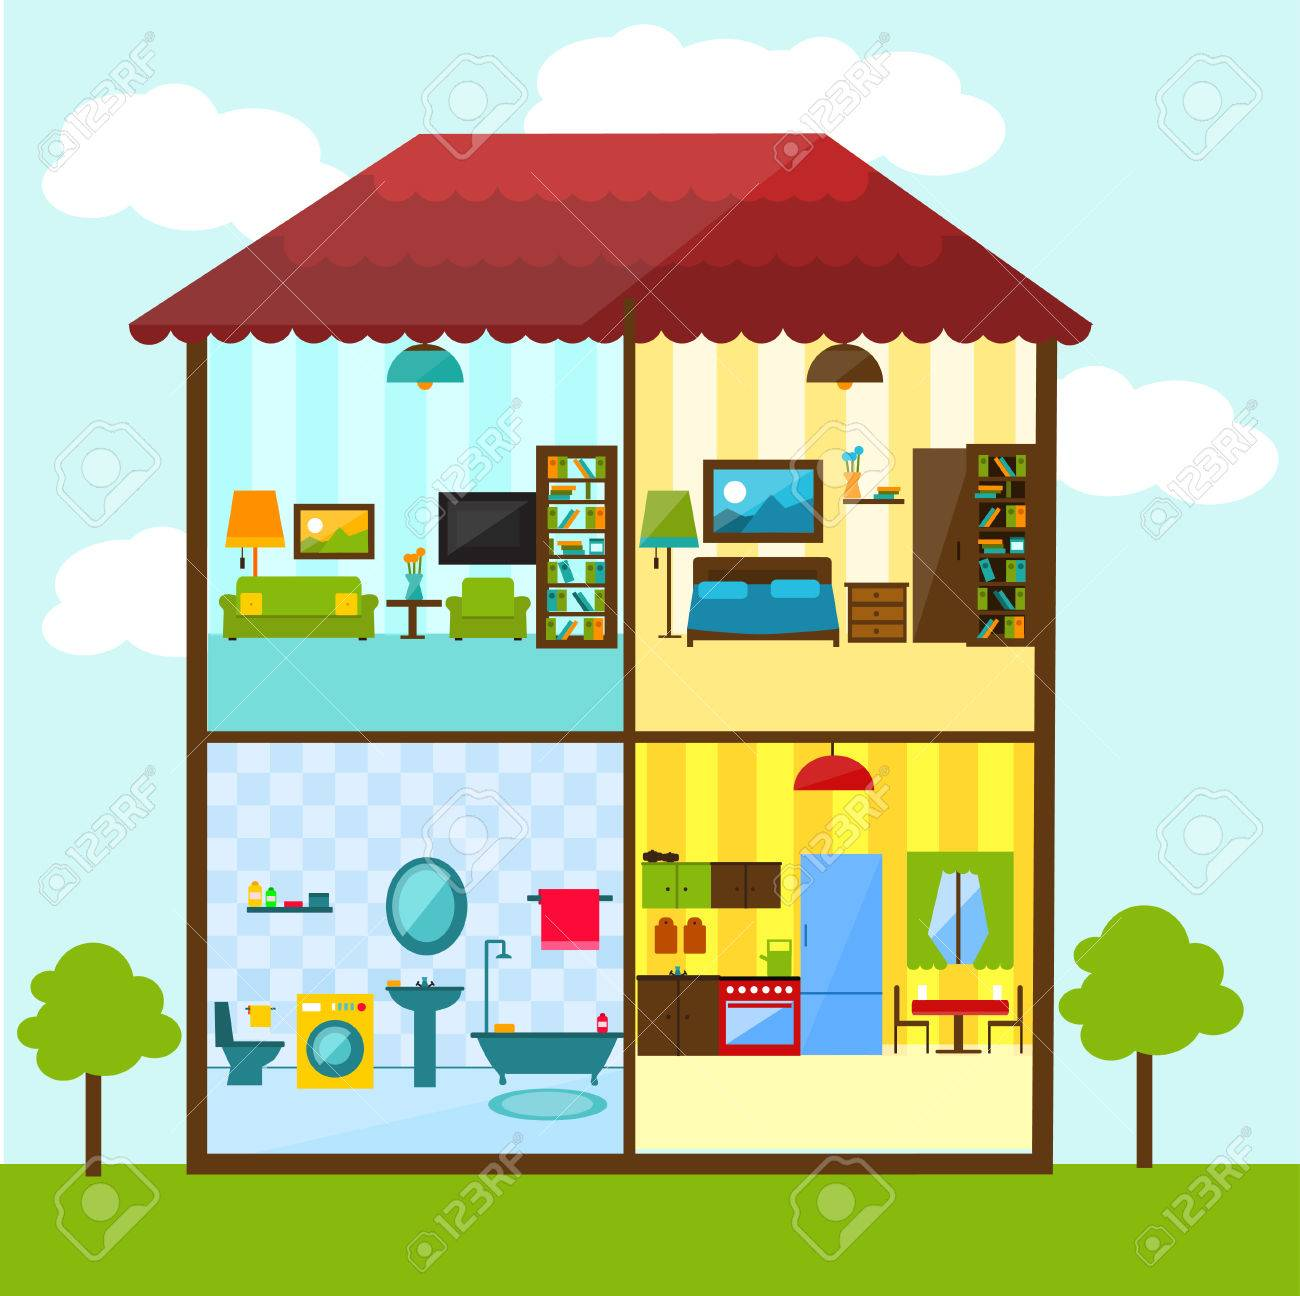 Living Room Bedroom Bathroom Kitchen. Cross Section Of House In Flat Style Illustration Bathroom Living Room Kitchen